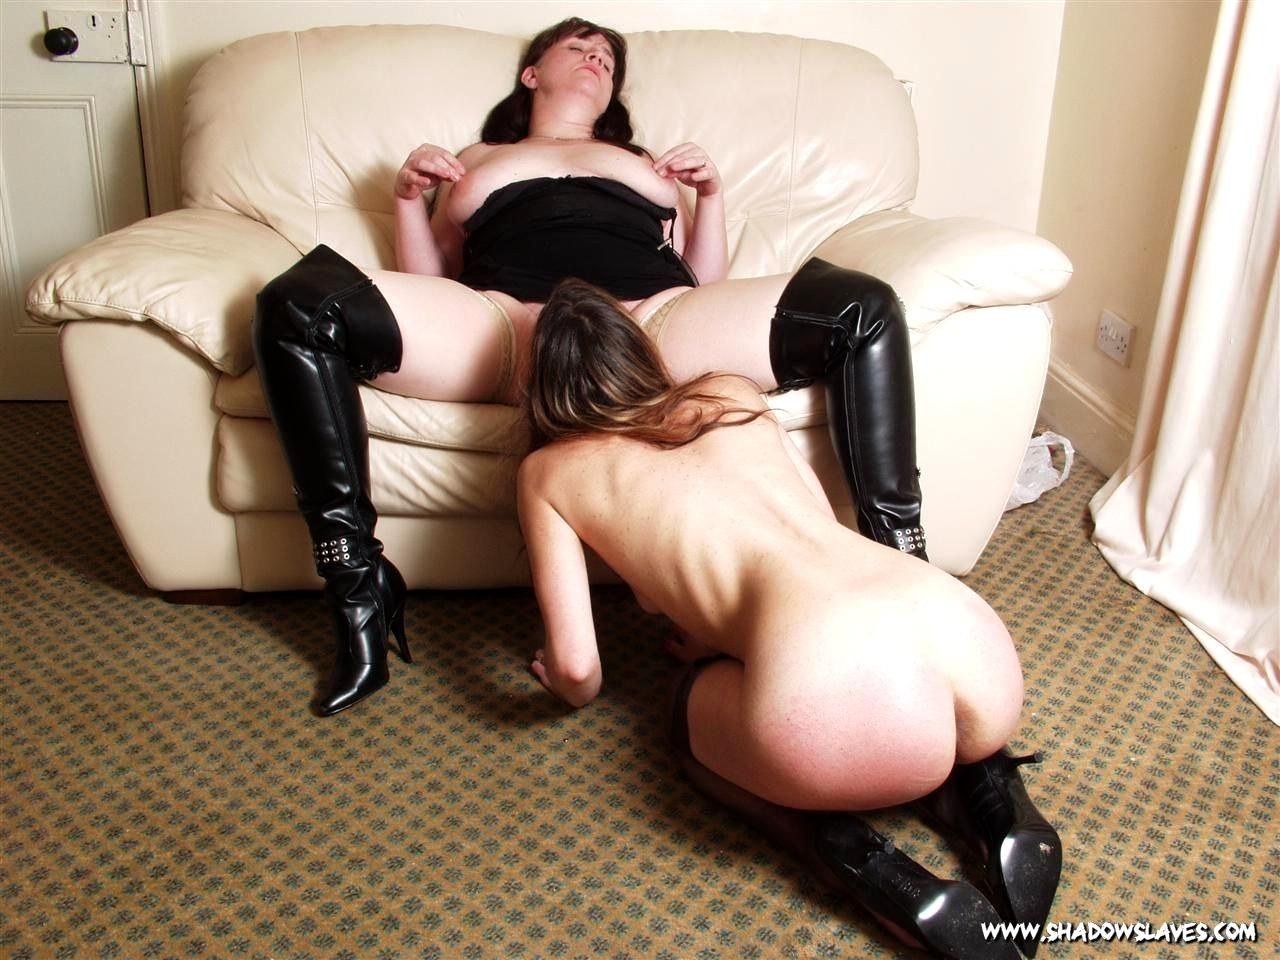 Shadow Slaves Emma Louise Jay Vip Lesbian Spanking Area-4504